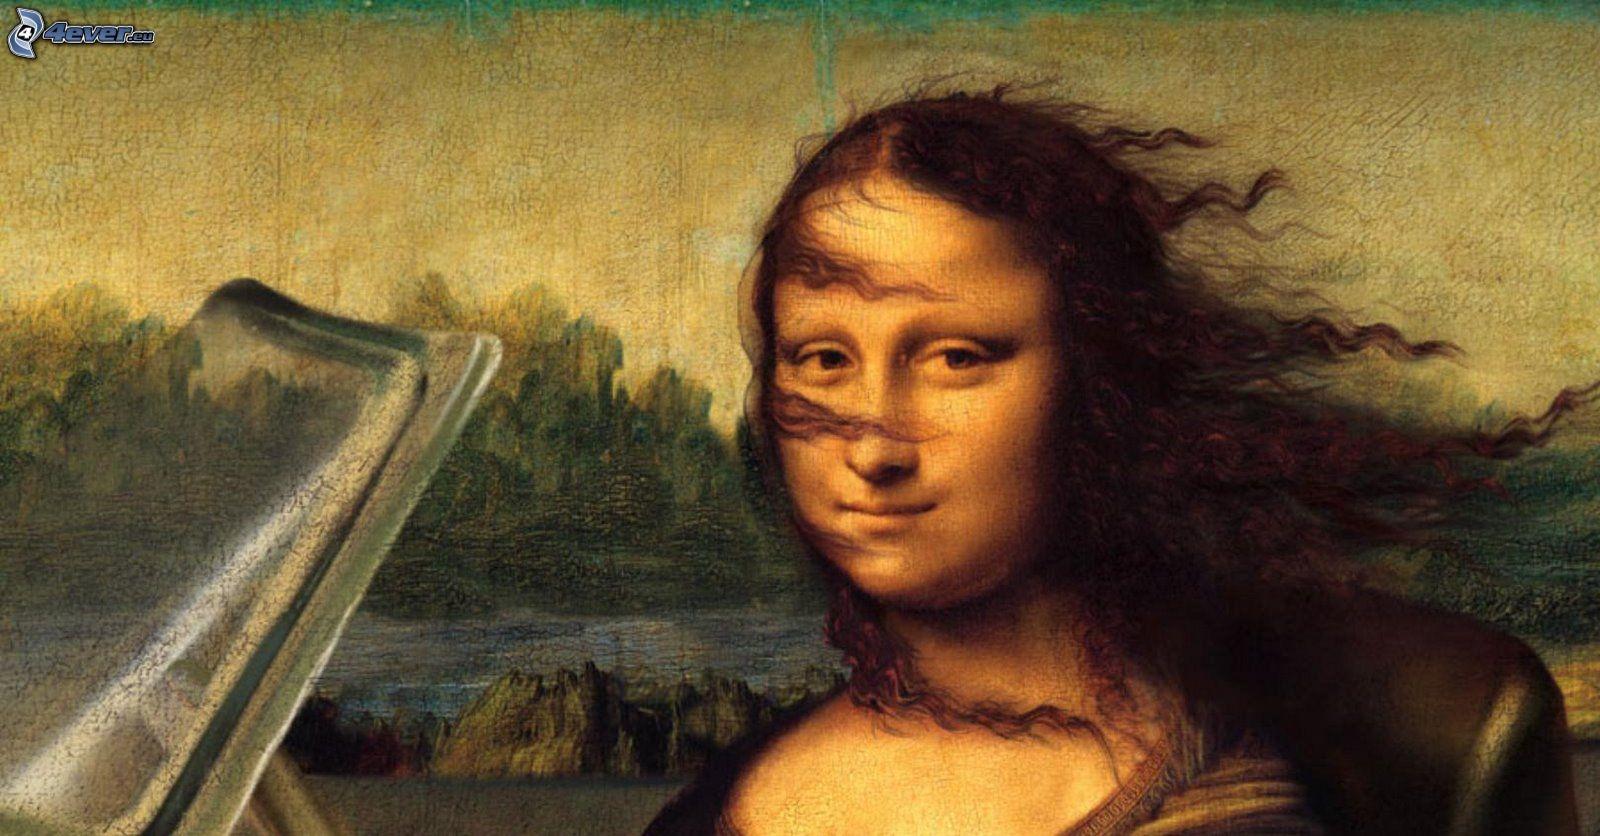 [ 6Xav2 ] Le Zèbre  Mona-lisa,-parodie,-cheveux-souffles,-cabriolet-162157